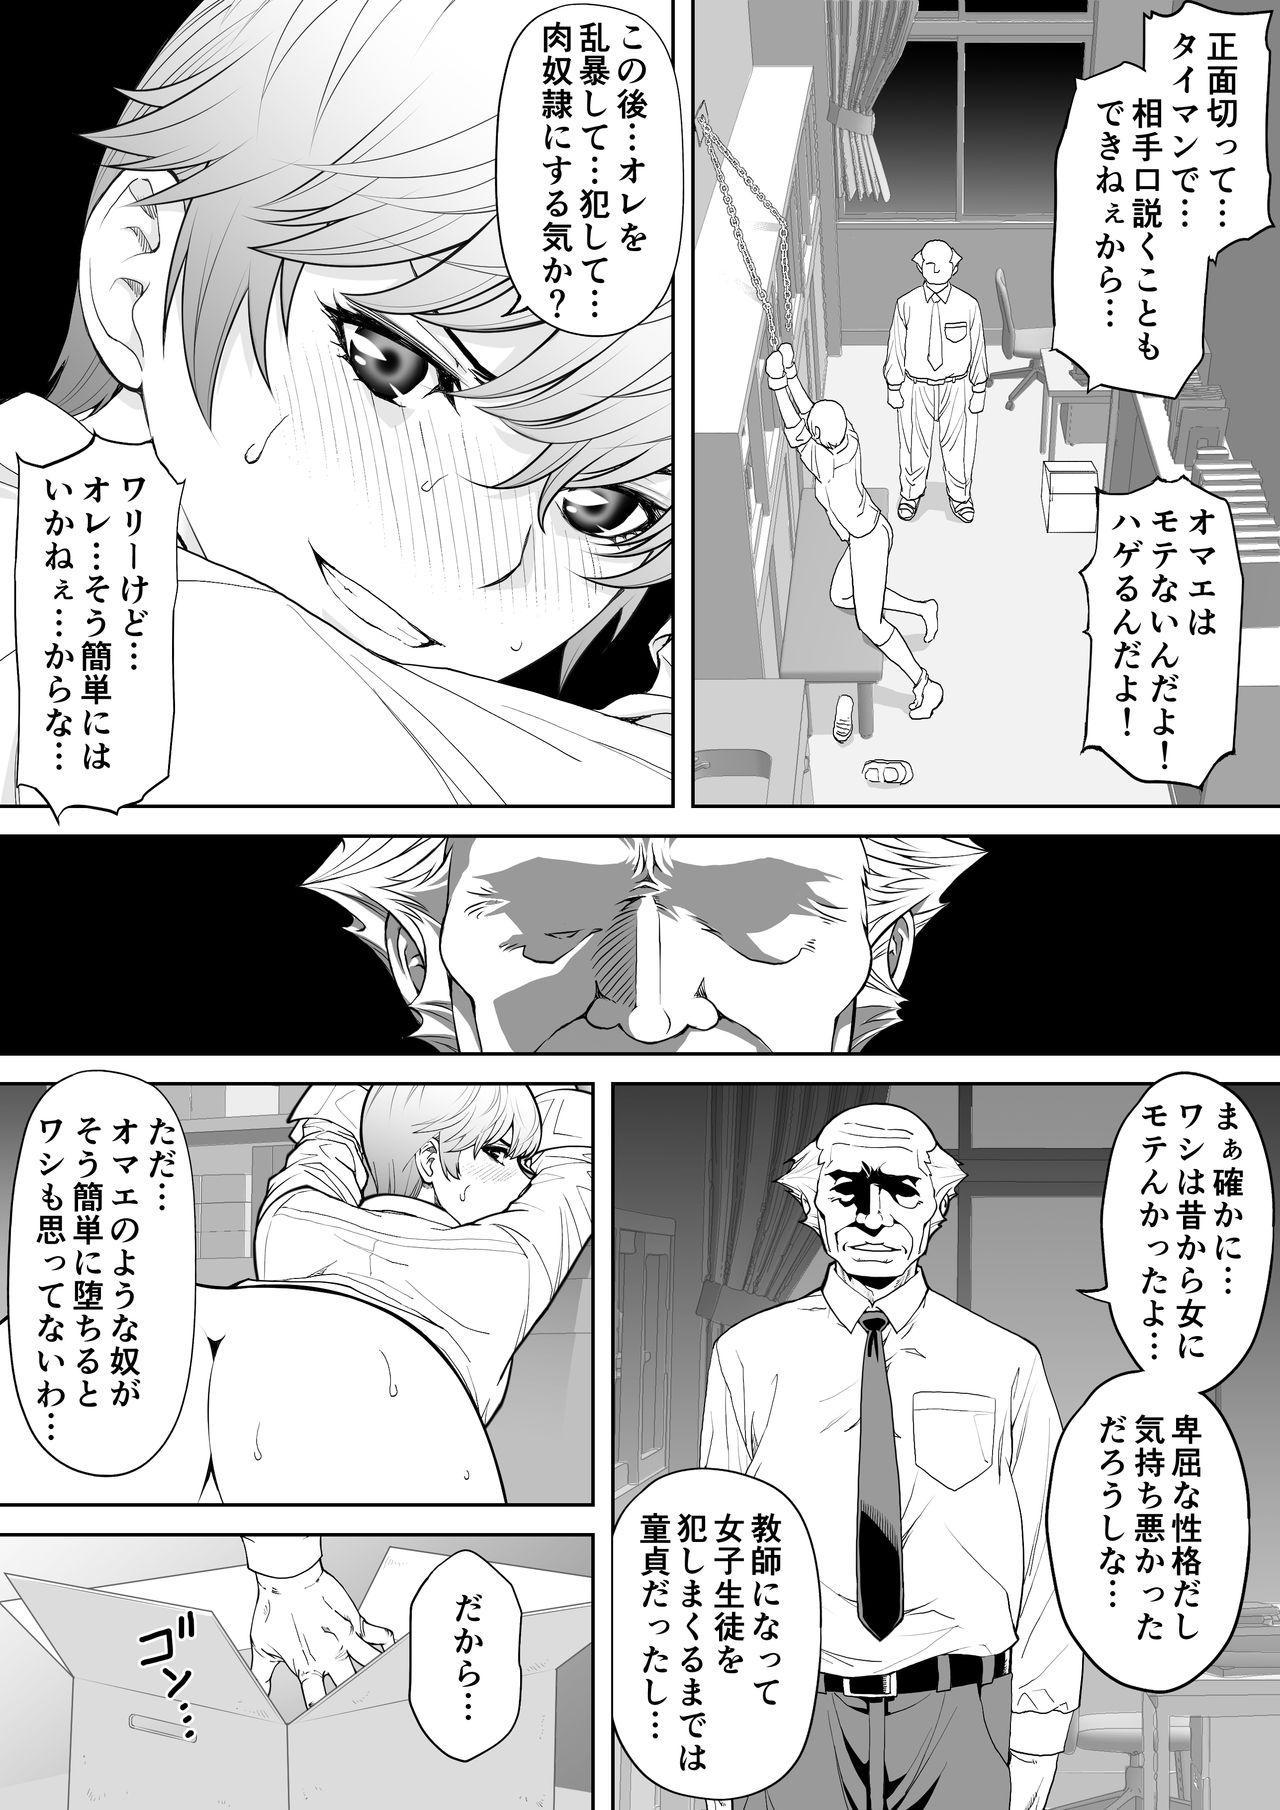 Namaiki mmusume ni tsuyo ● ikīki jugyō 17